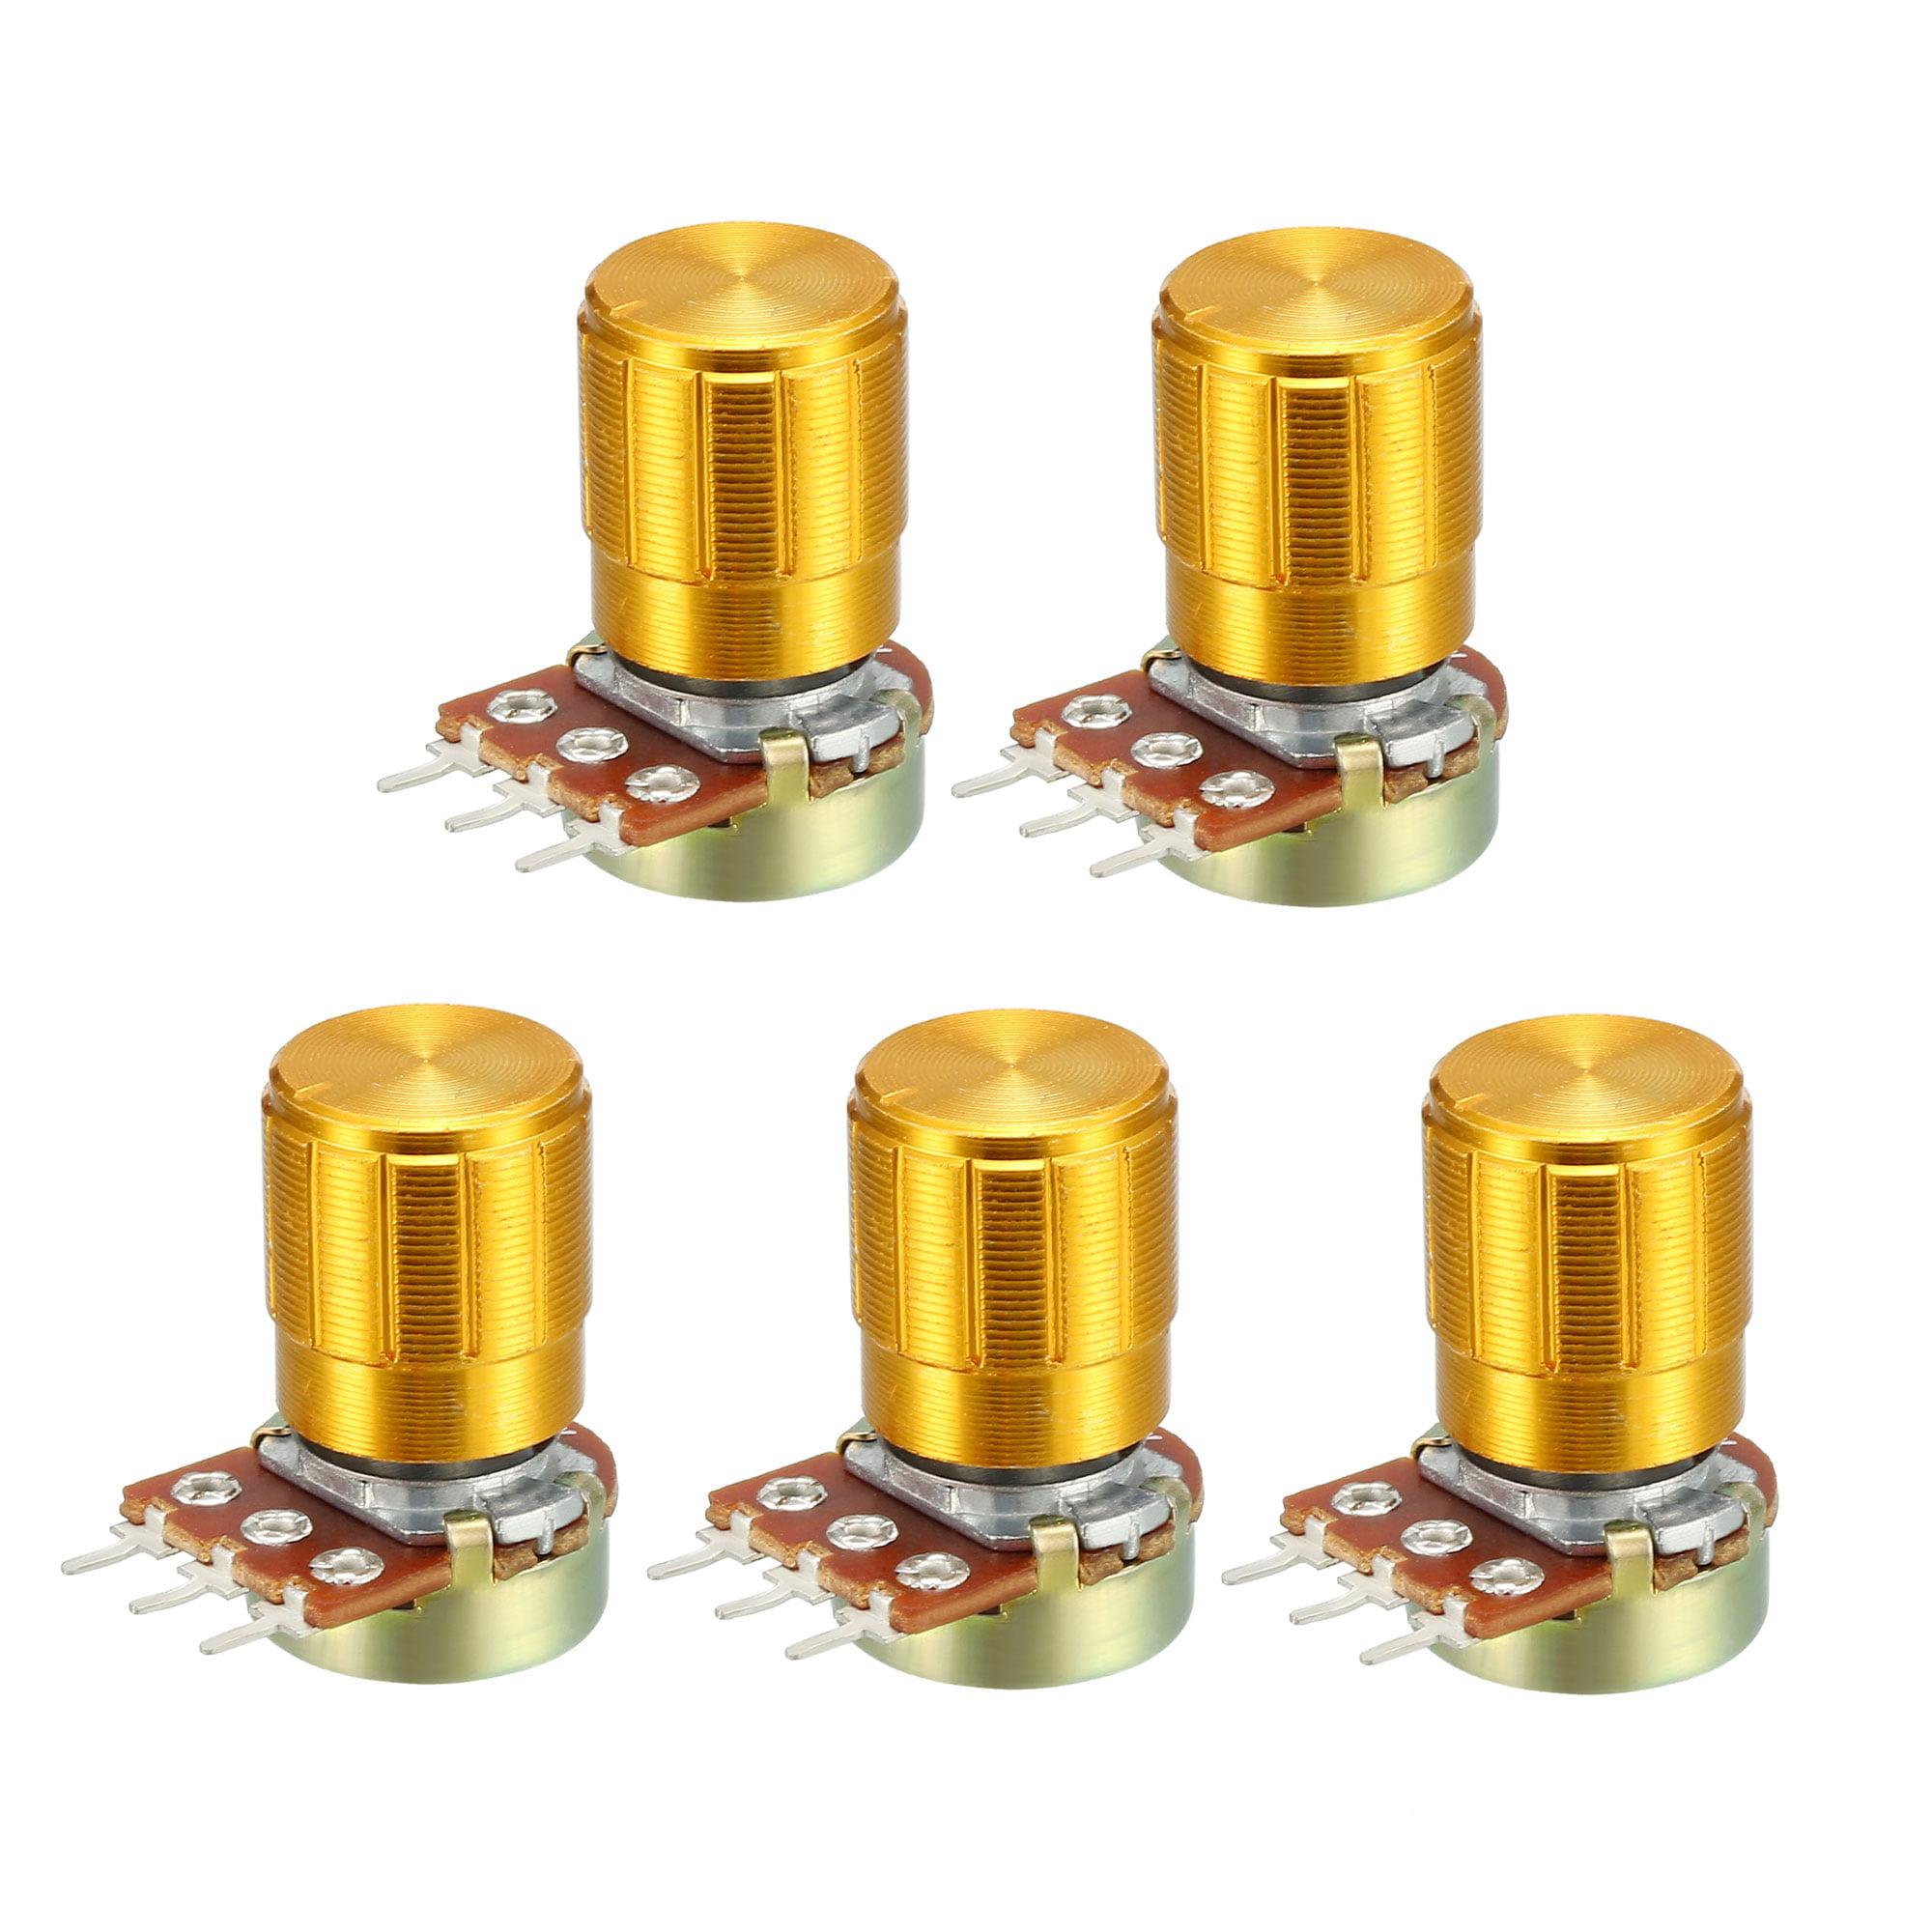 WH148 1K Ohm Variable Resistors Single Turn Rotary Carbon Film Taper Potentiometer W Knobs 5pcs